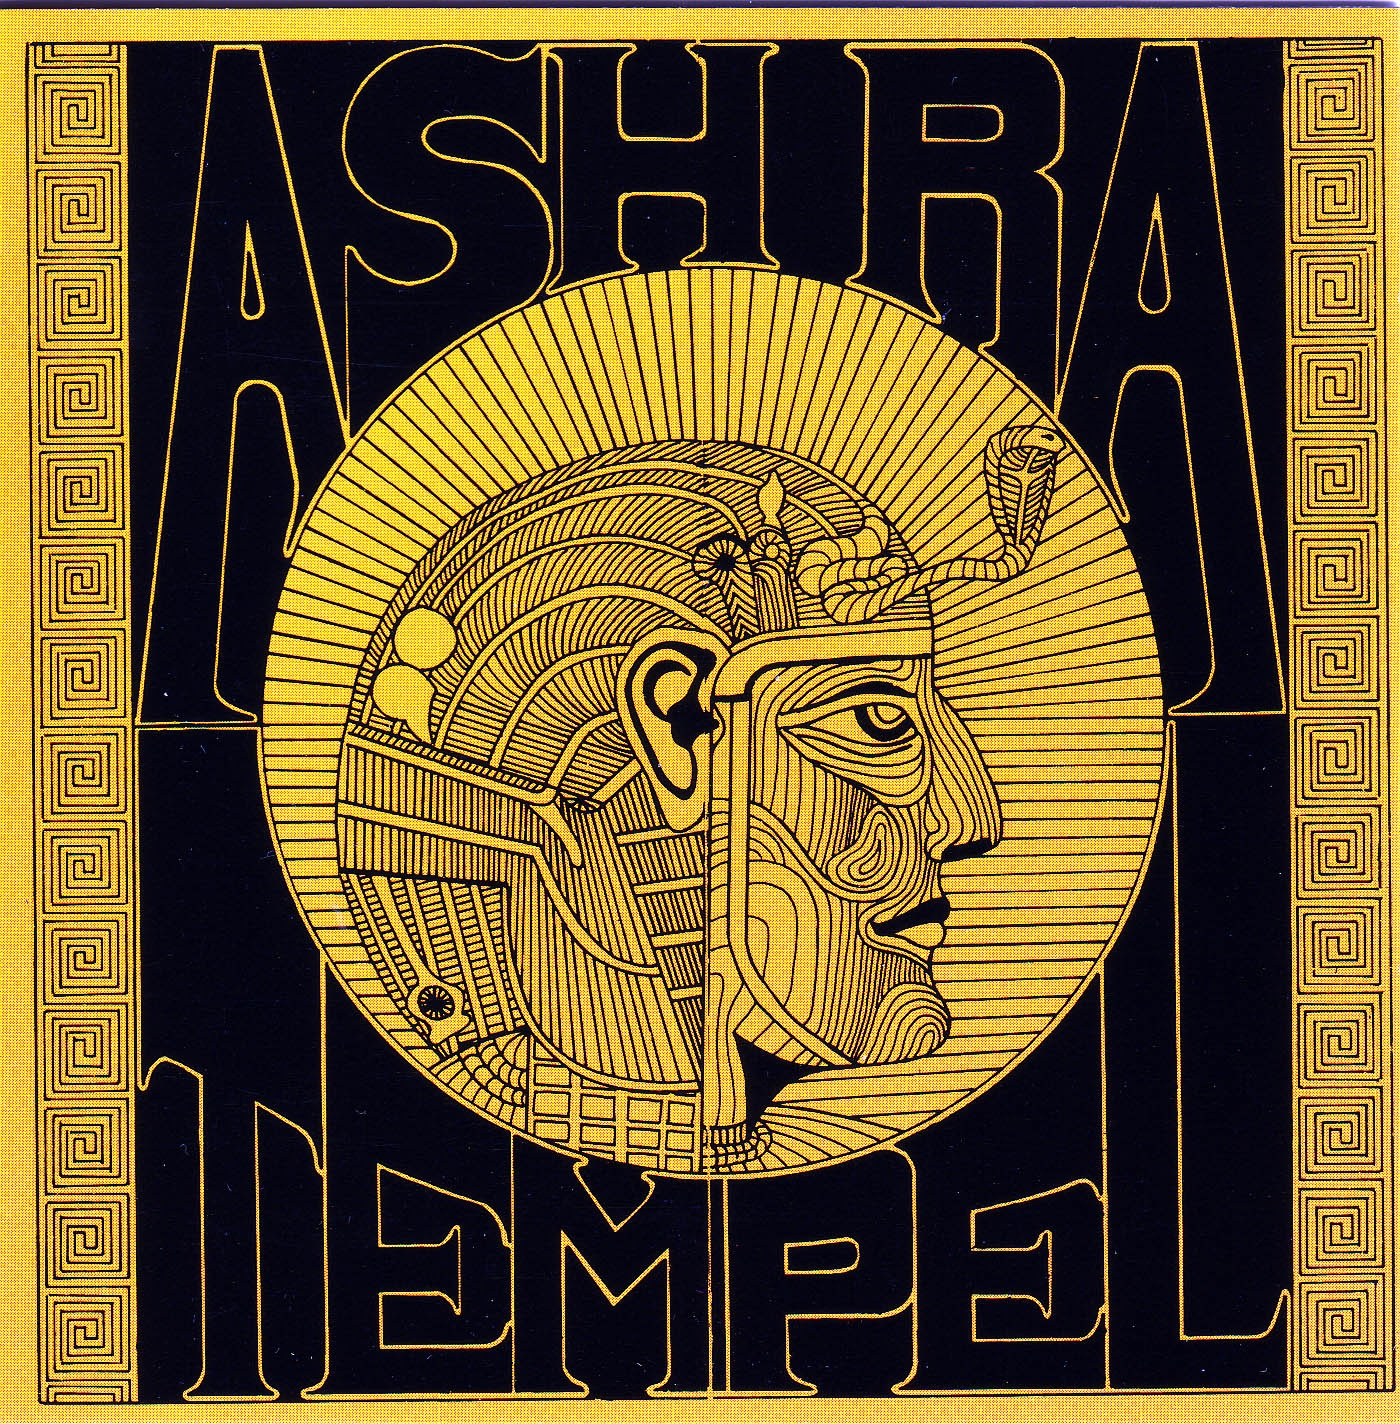 ash-ra-tempel-ash-ra-tempel-1971